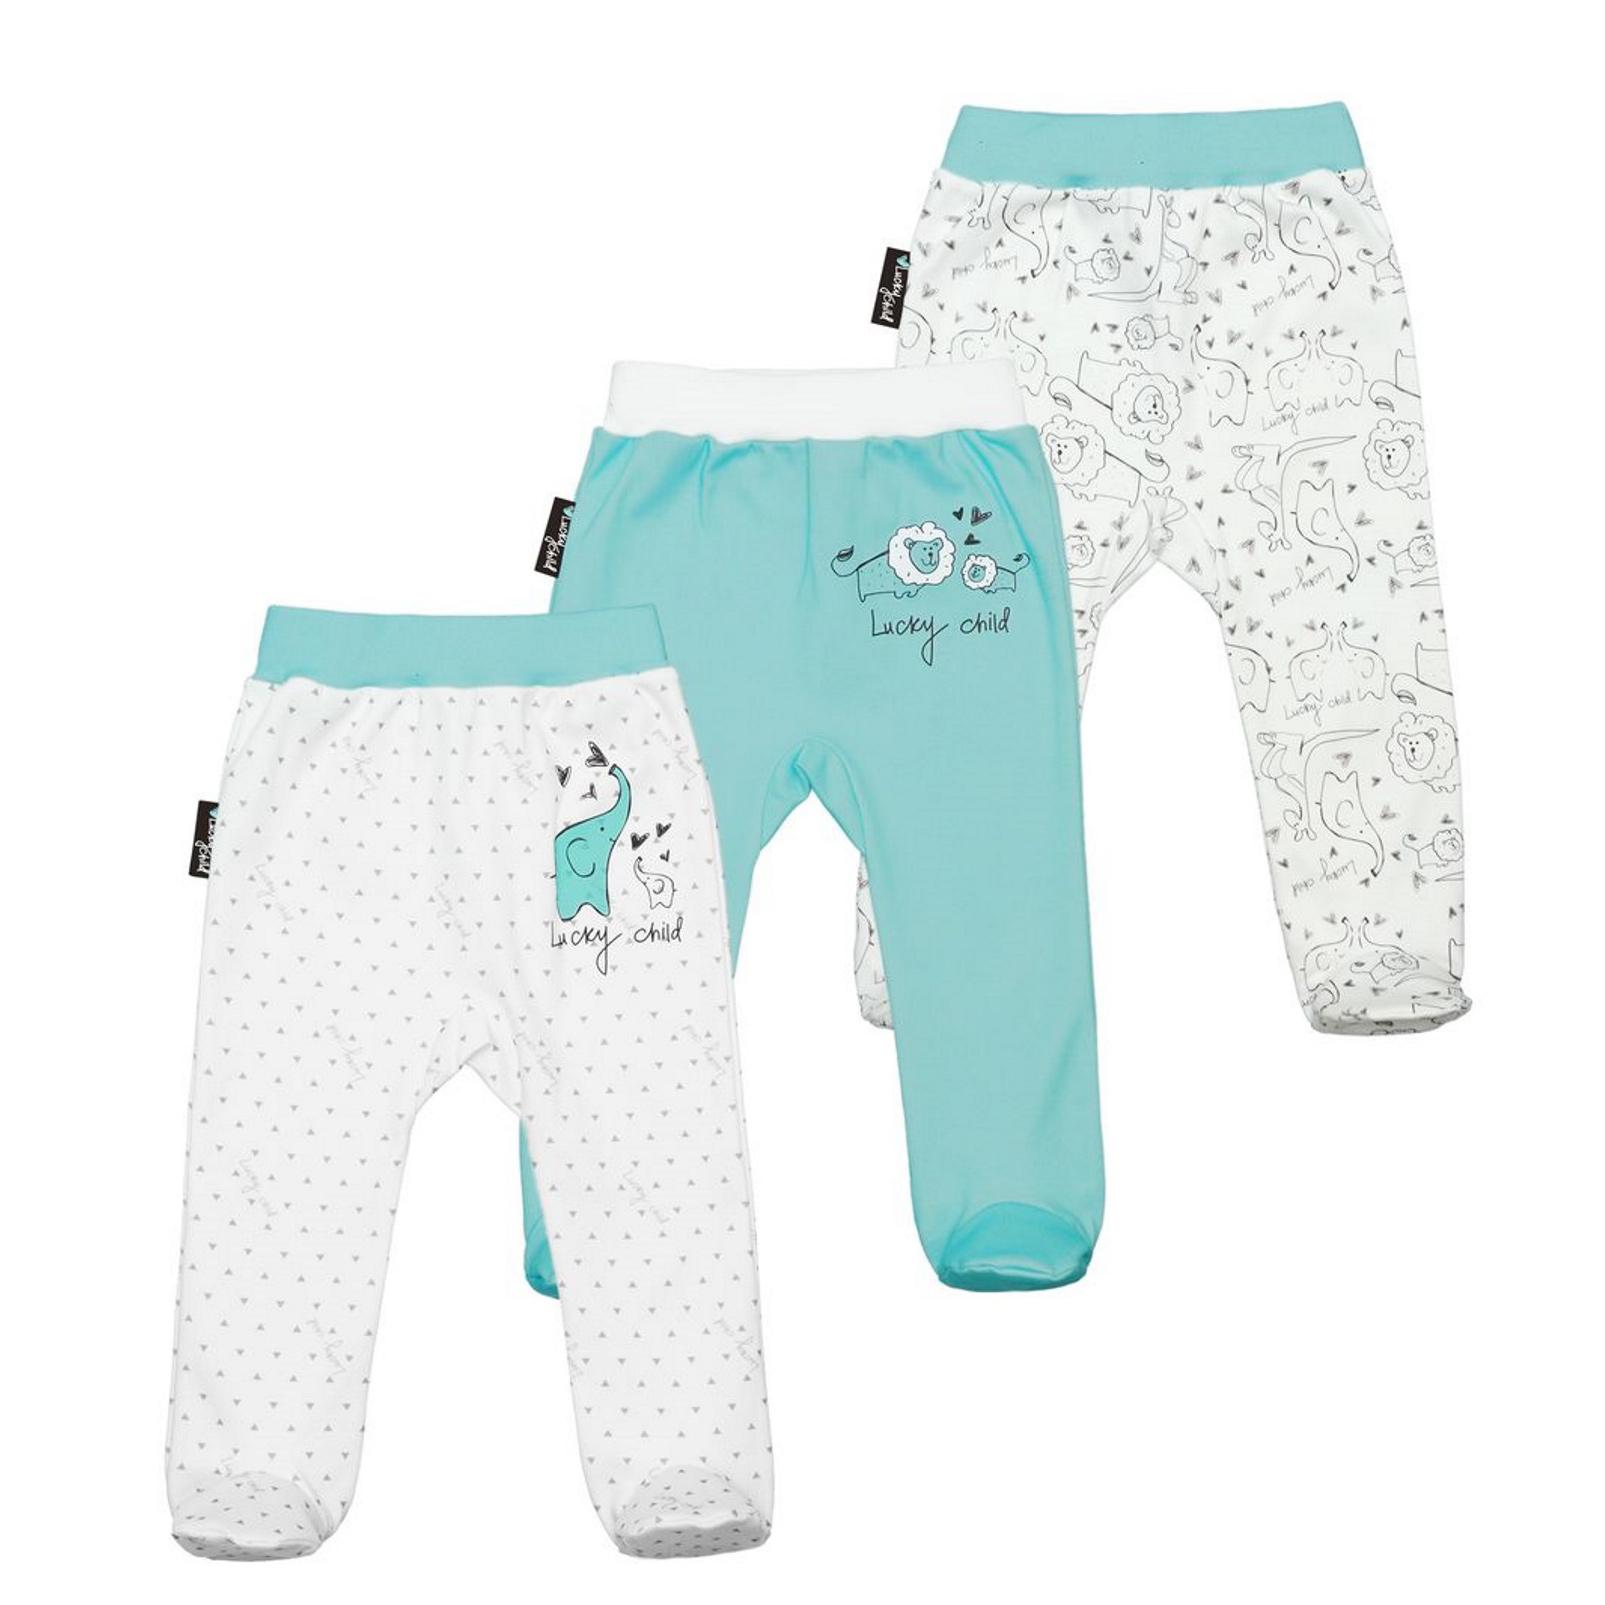 Фото - Комплект ползунков Lucky Child Зоопарк 3 шт 74-80 комплект брюк lucky child котики 3 шт 74 80